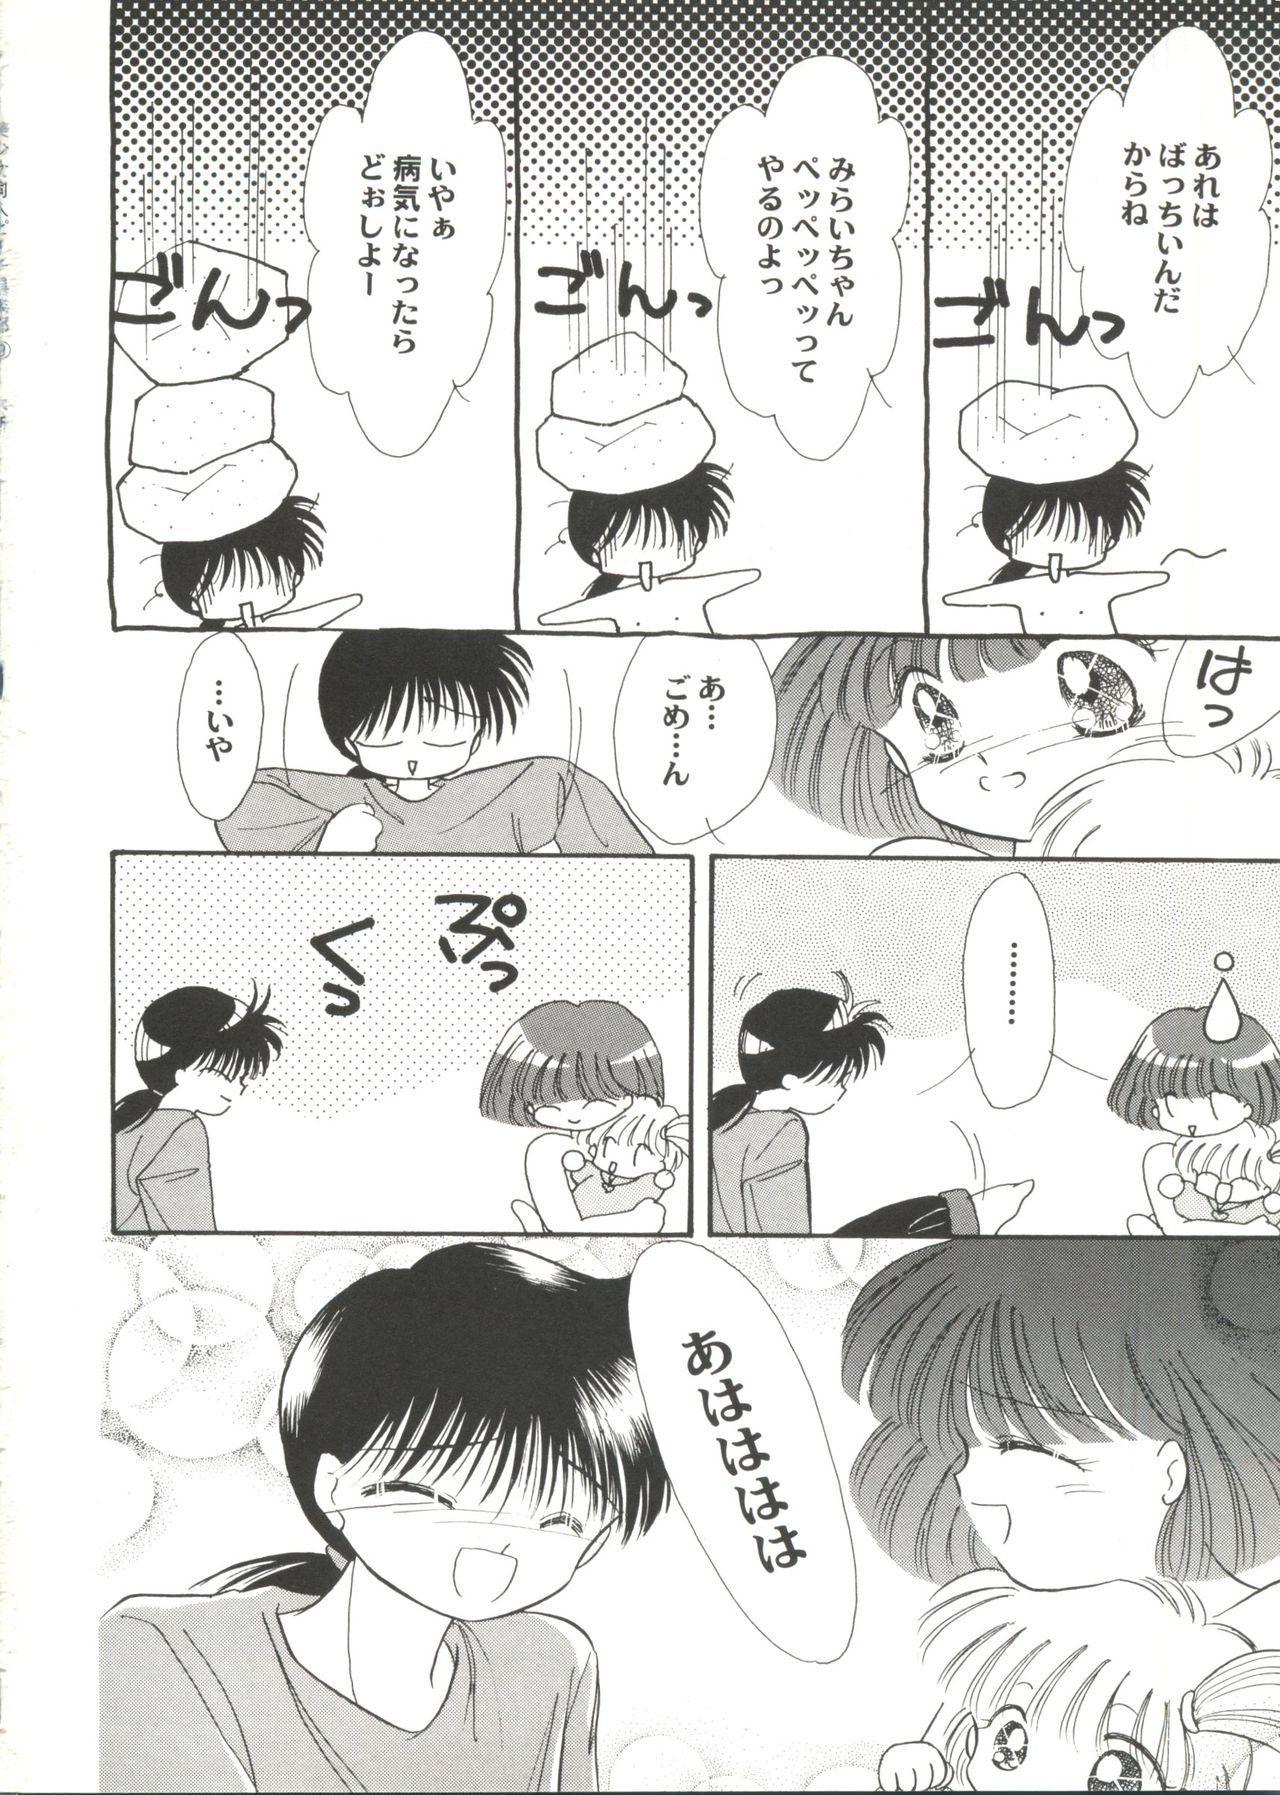 Bishoujo Doujin Peach Club - Pretty Gal's Fanzine Peach Club 9 97